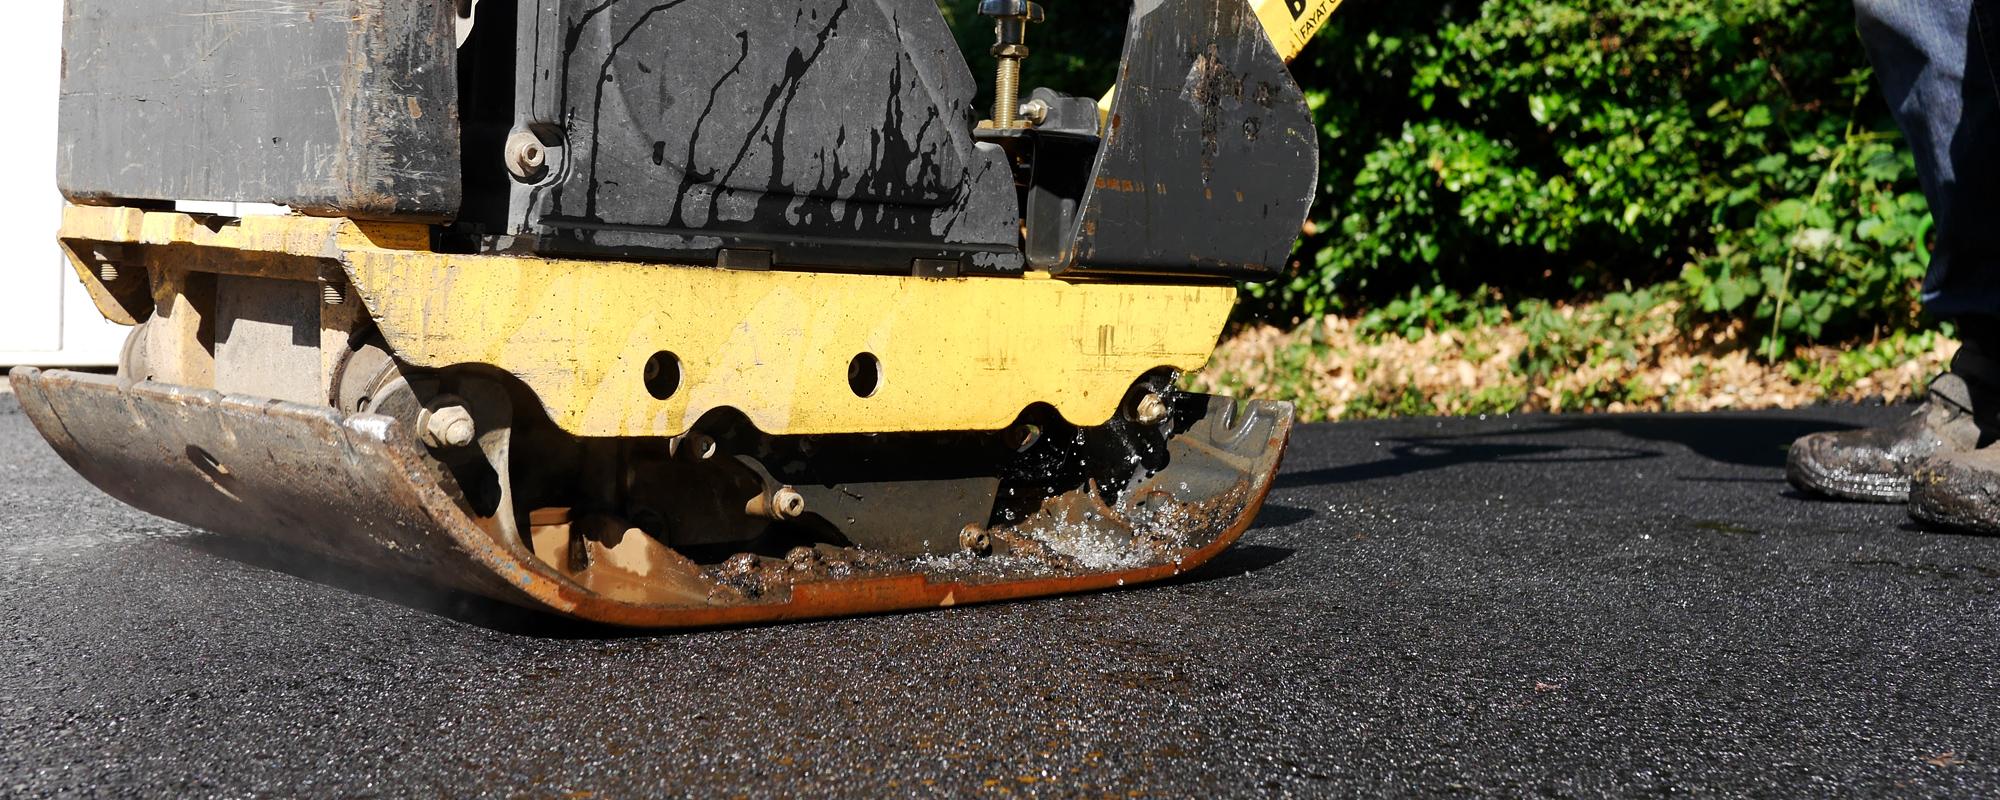 FLECK-Asphaltbau-asphaltieren